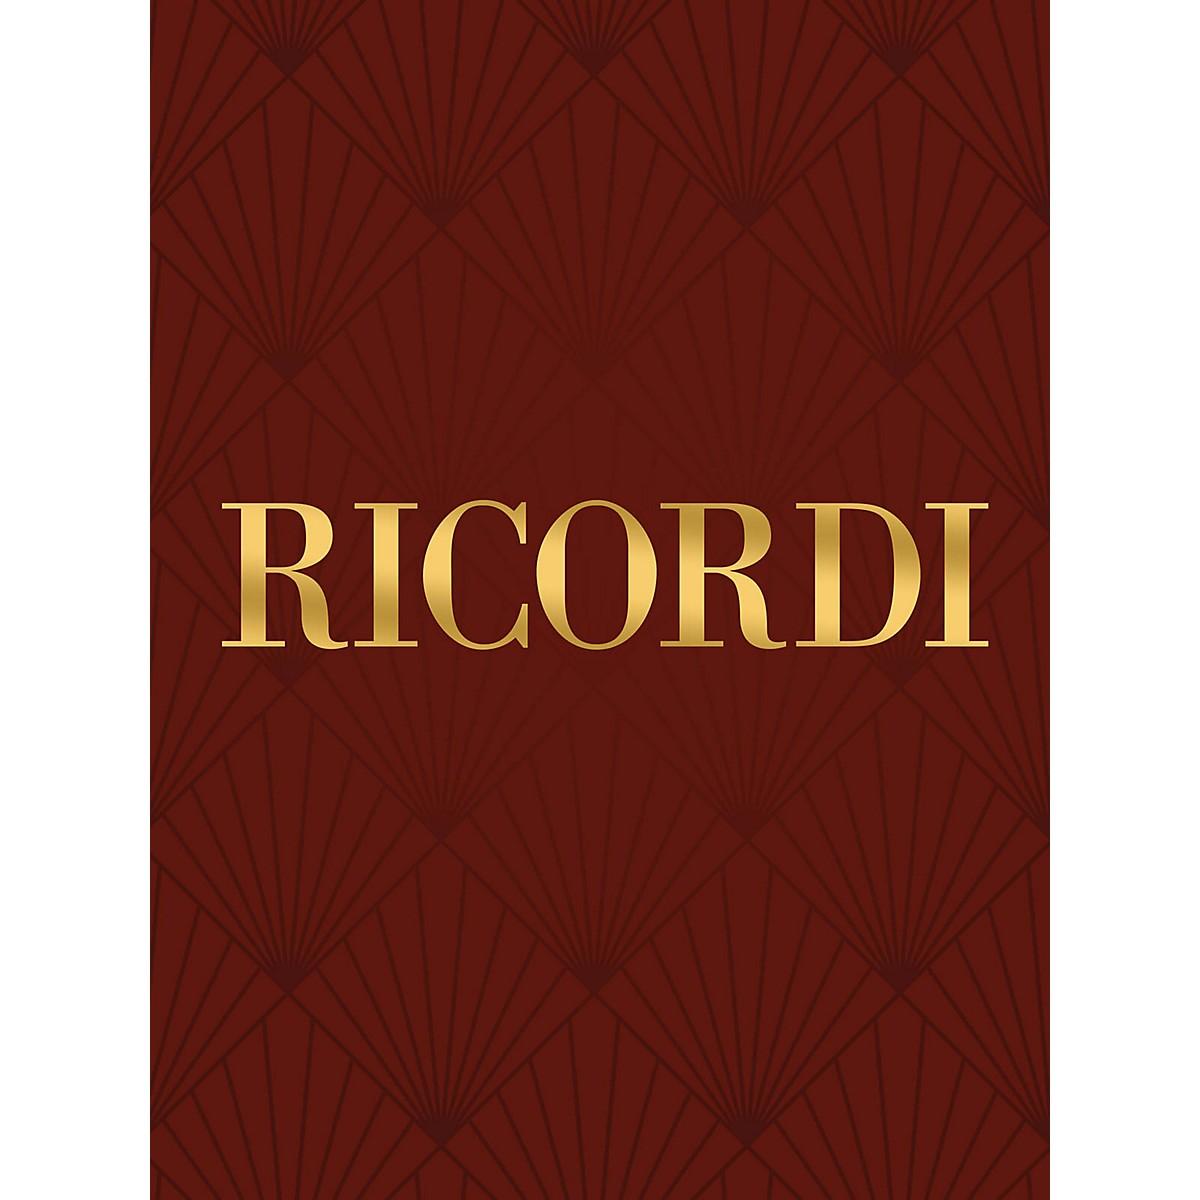 Ricordi Laetatus sum RV607 Study Score Series Composed by Antonio Vivaldi Edited by Michael Talbot